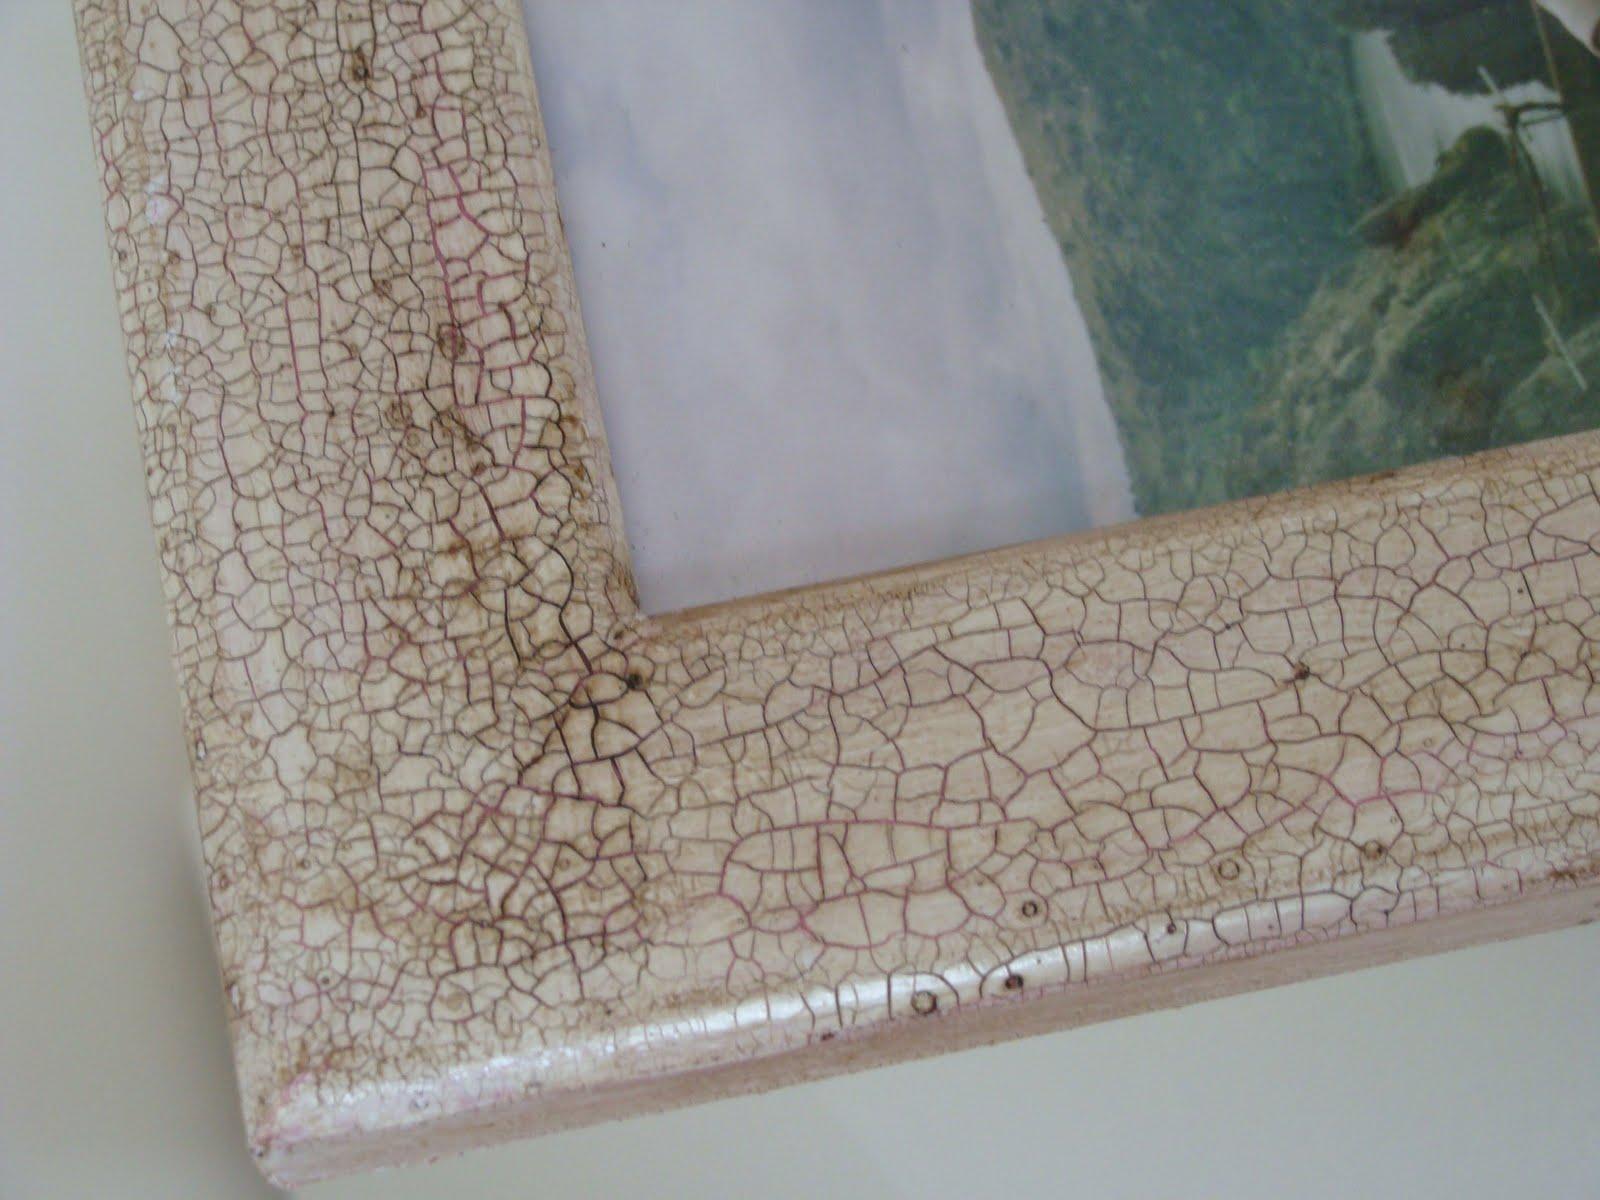 Haizego cuadro de madera craquelado - Craquelado de madera ...